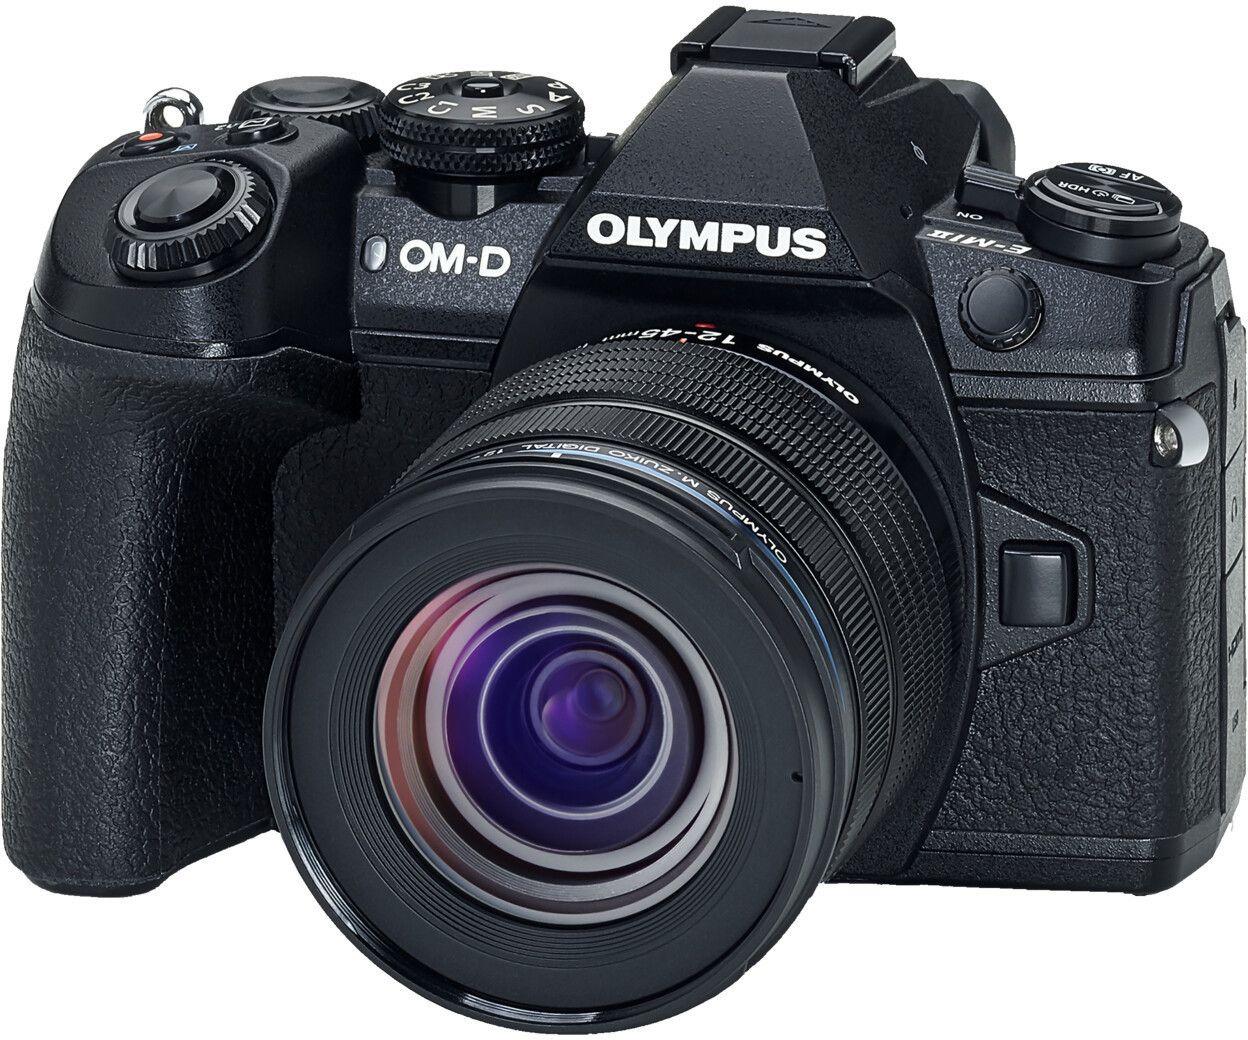 Olympus OM-D E-M1 Mark II MFT Systemkamera inkl. 12-45mm F4 Objektiv oder inkl. 12-40mm F2,8 Objektiv für 1199€